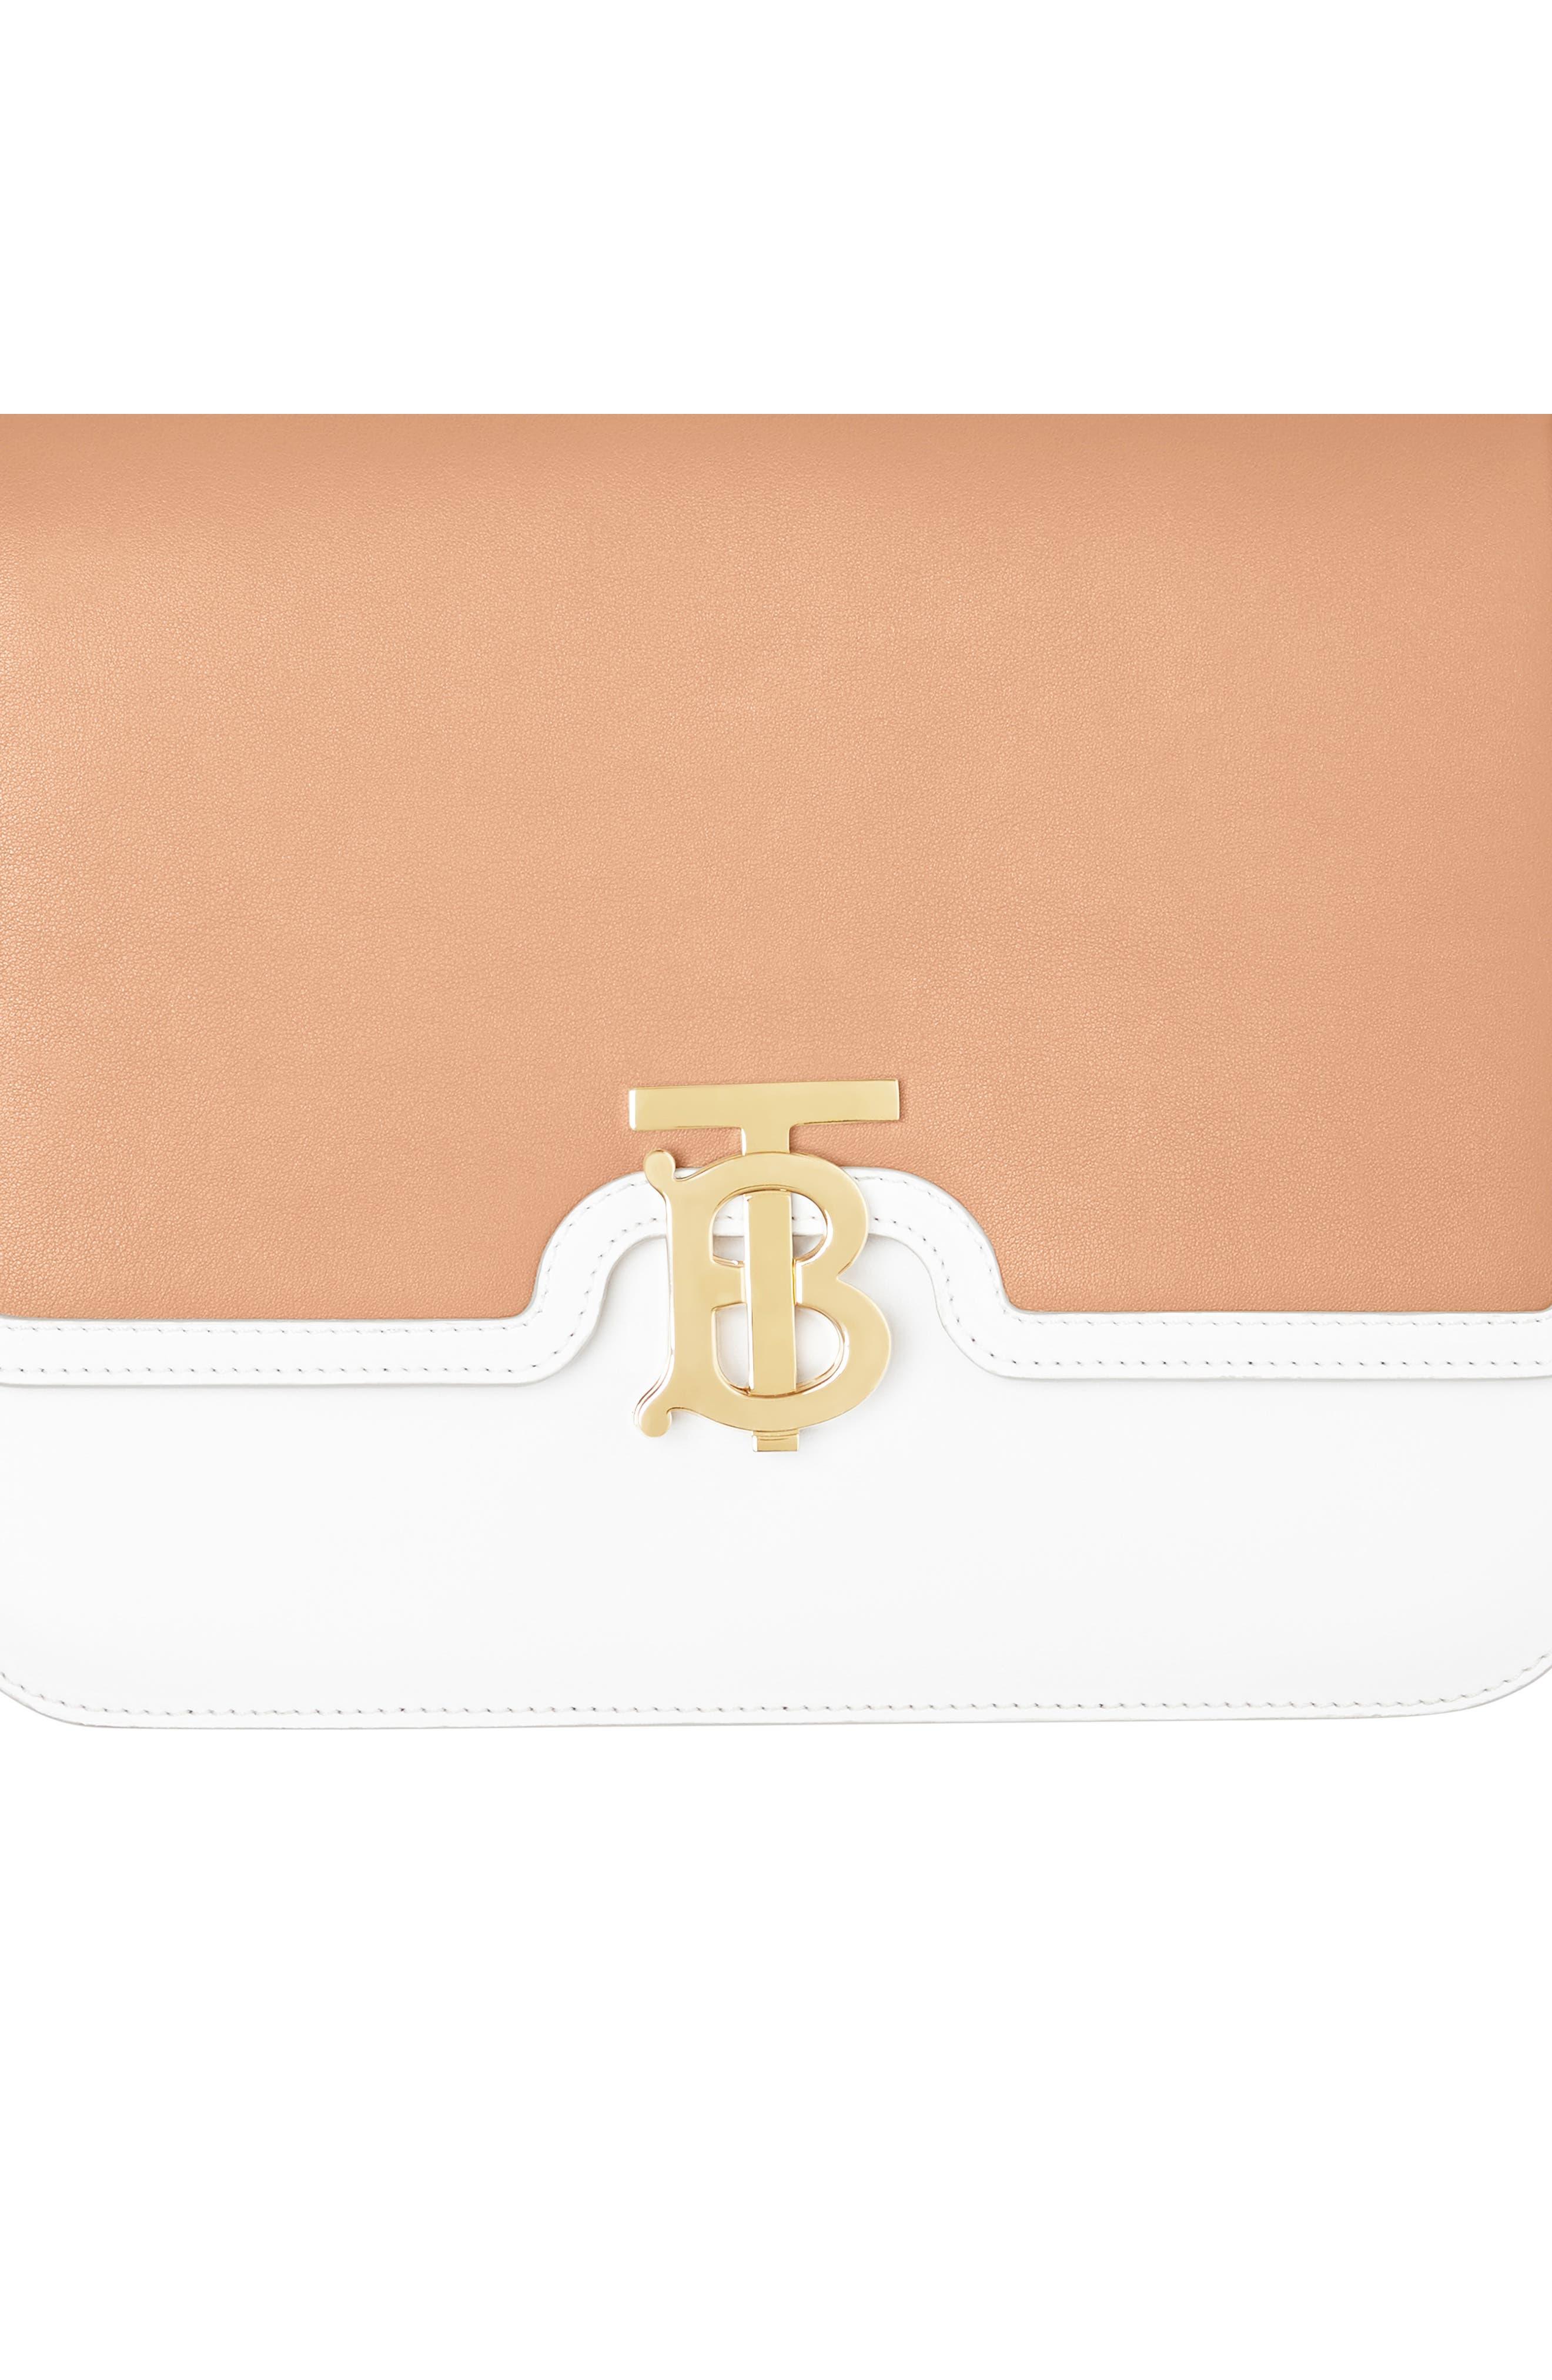 BURBERRY,                             Medium Two-Tone Leather TB Bag,                             Alternate thumbnail 5, color,                             CHALK WHITE/ LIGHT CAMEL